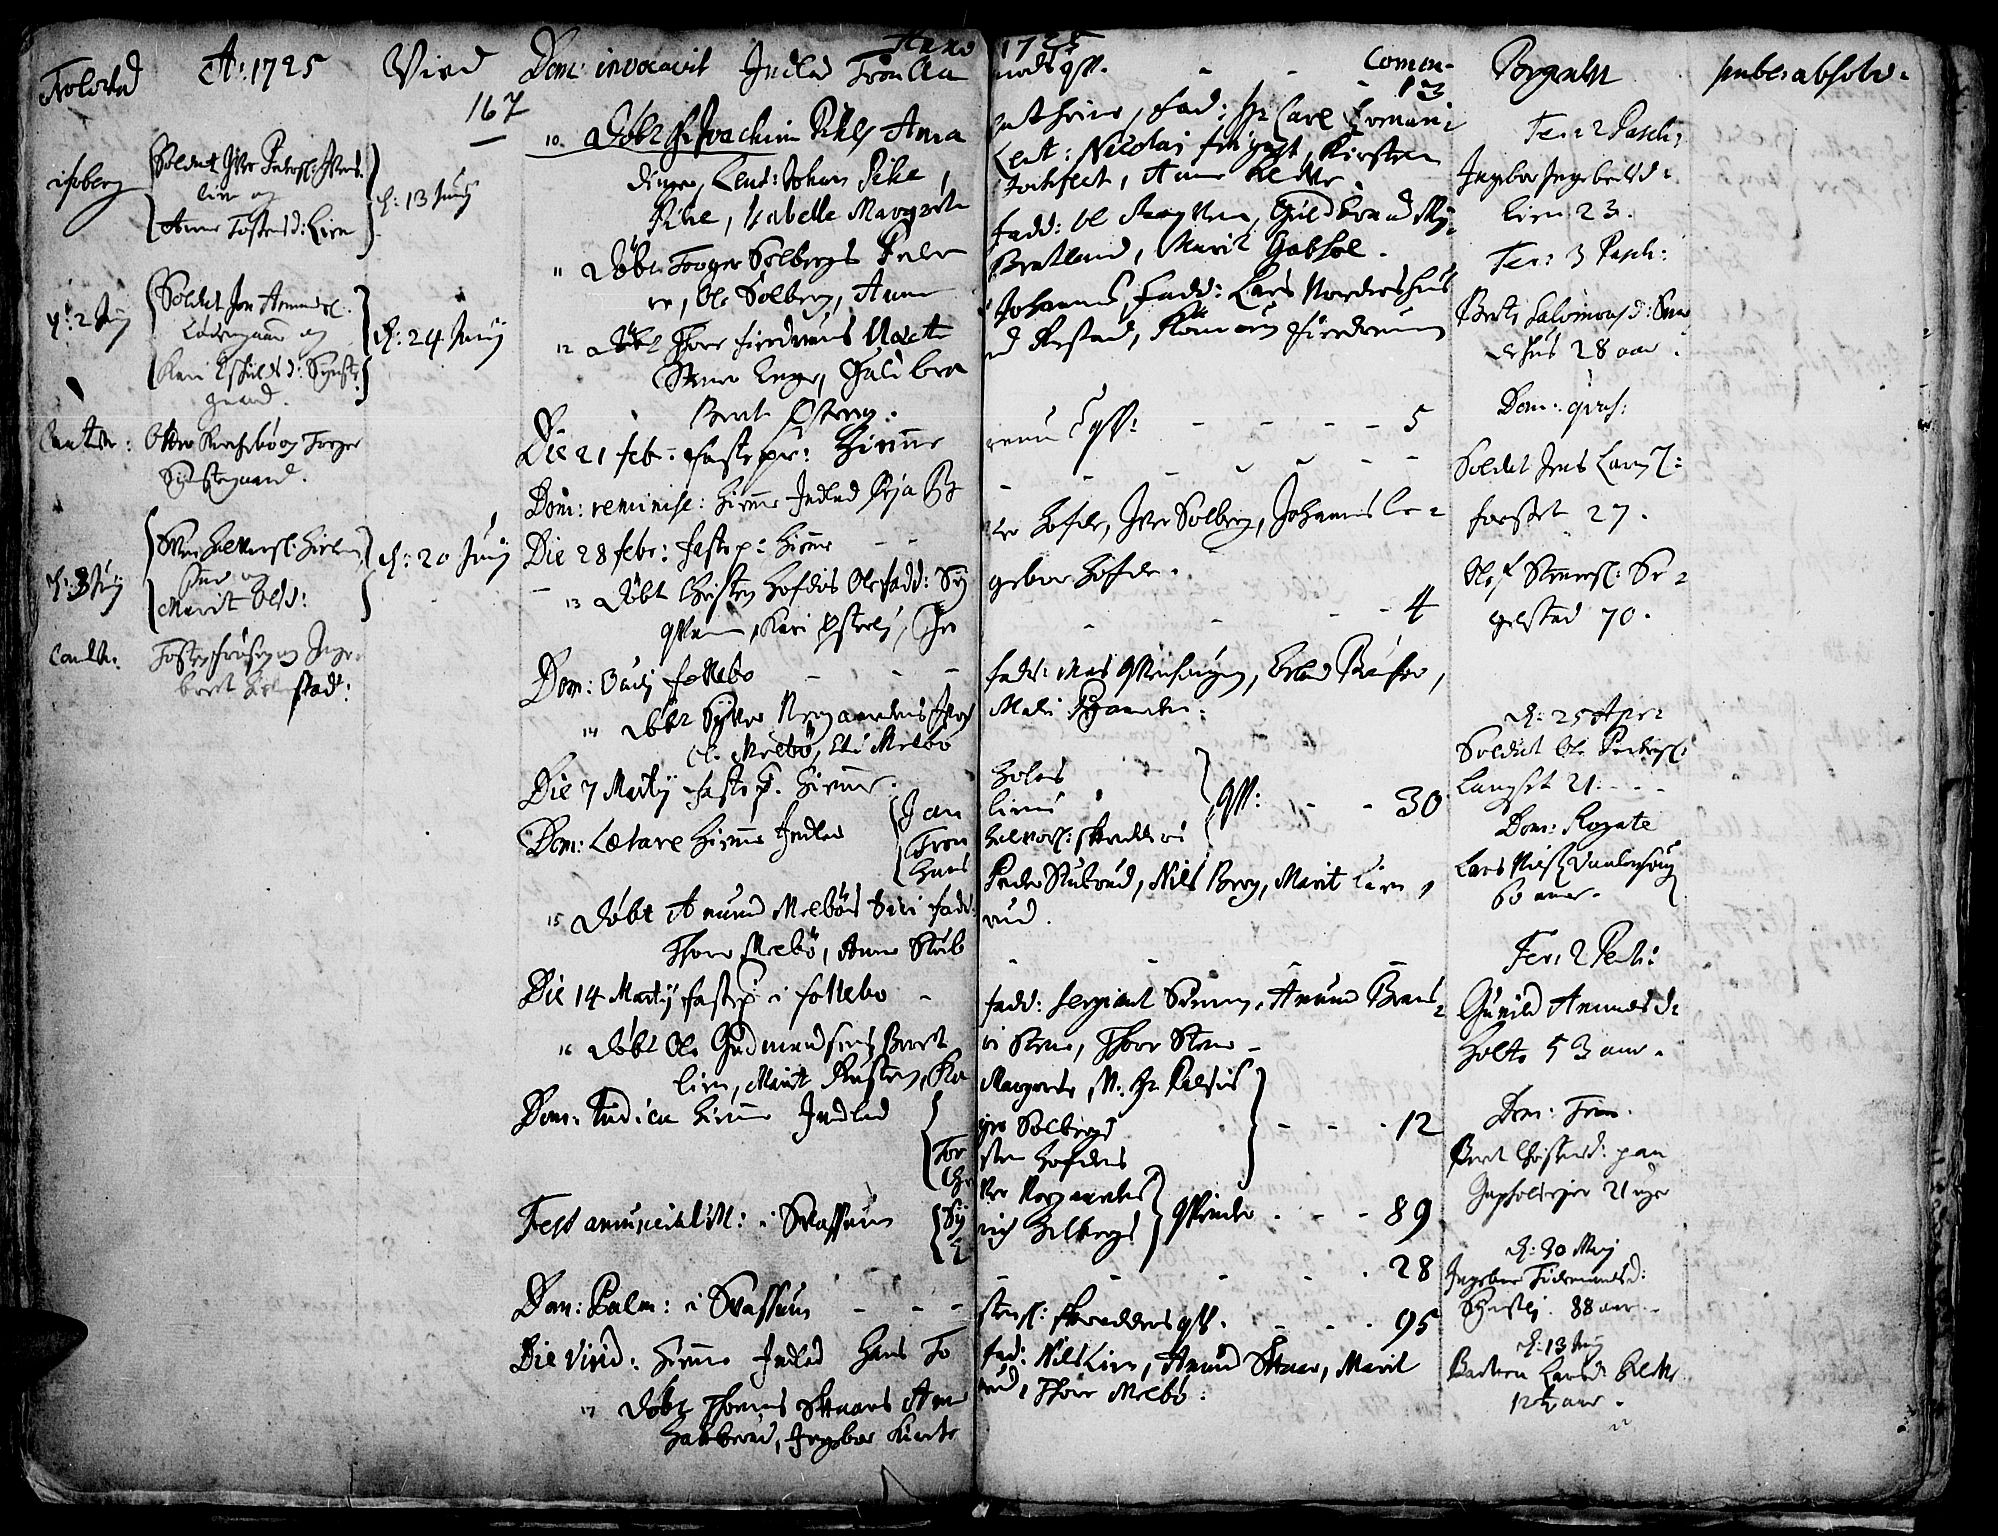 SAH, Gausdal prestekontor, Ministerialbok nr. 1, 1693-1728, s. 167